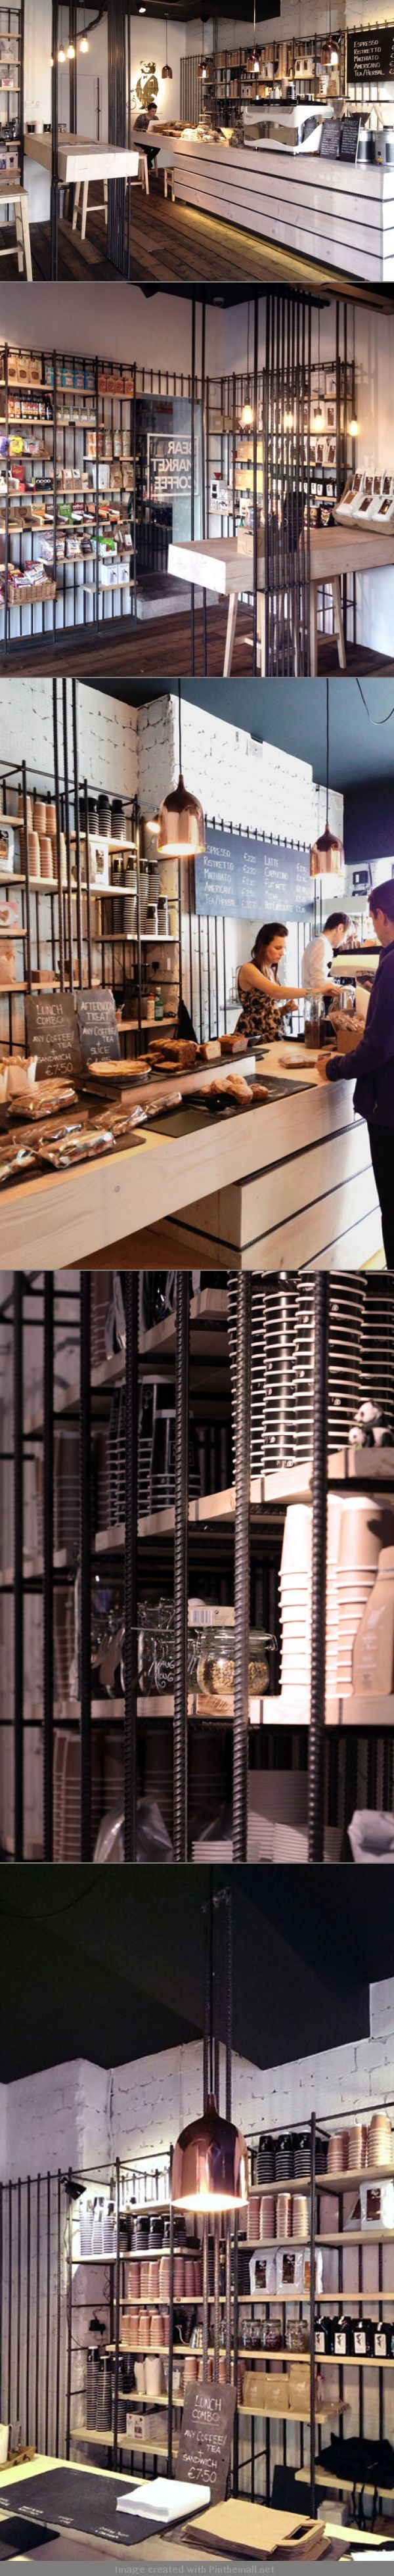 coffe shop in Dublin By VAV architects